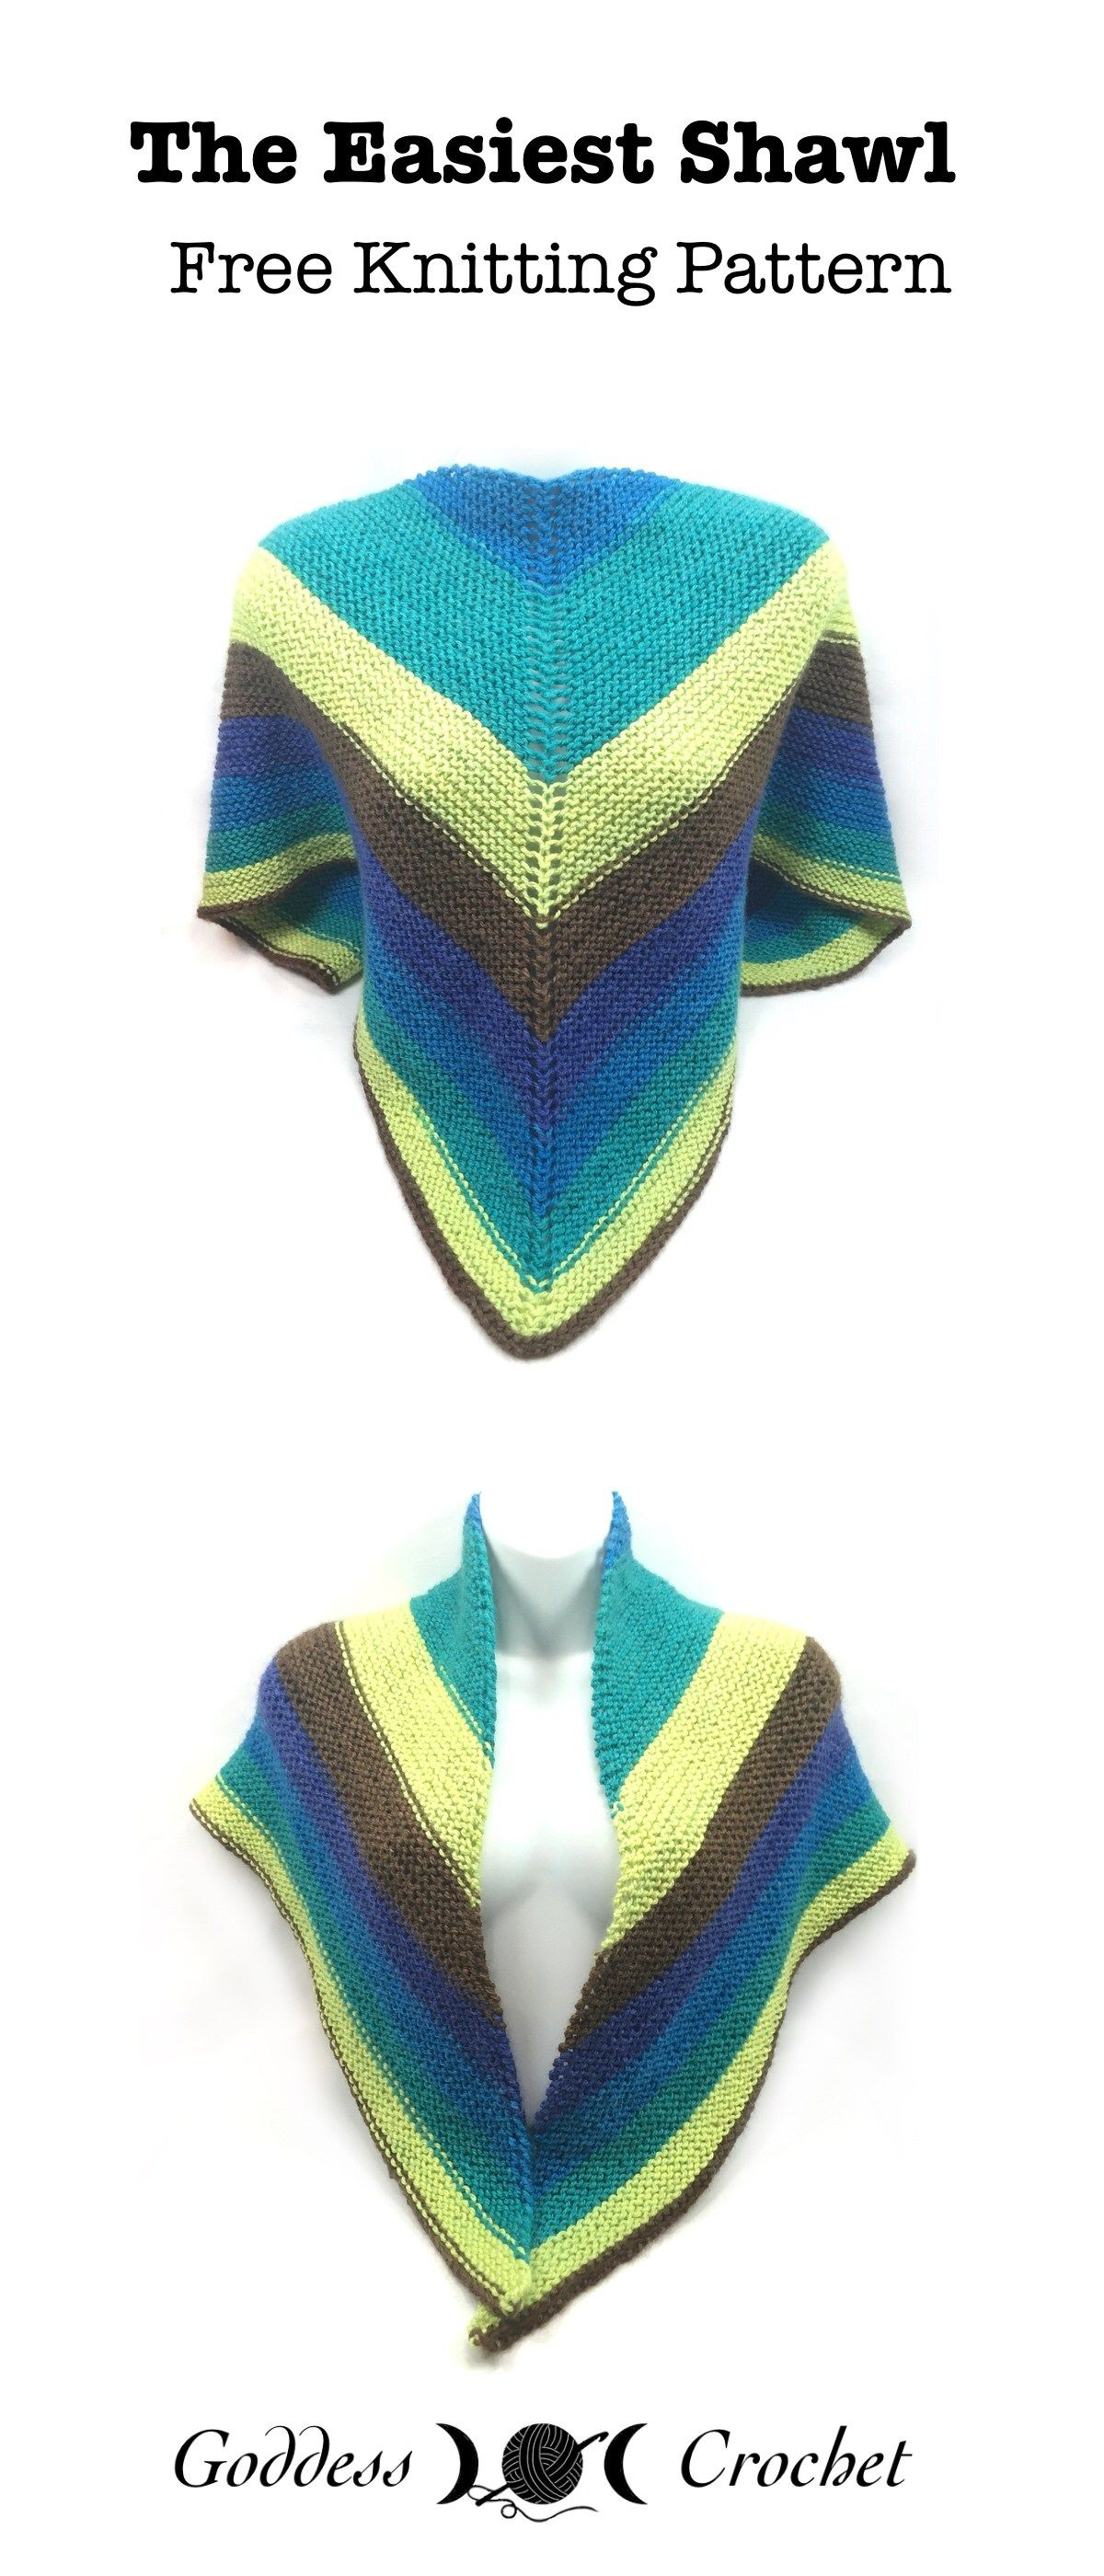 The Easiest Shawl - Free Knitting Pattern   Blogger Knitting ...